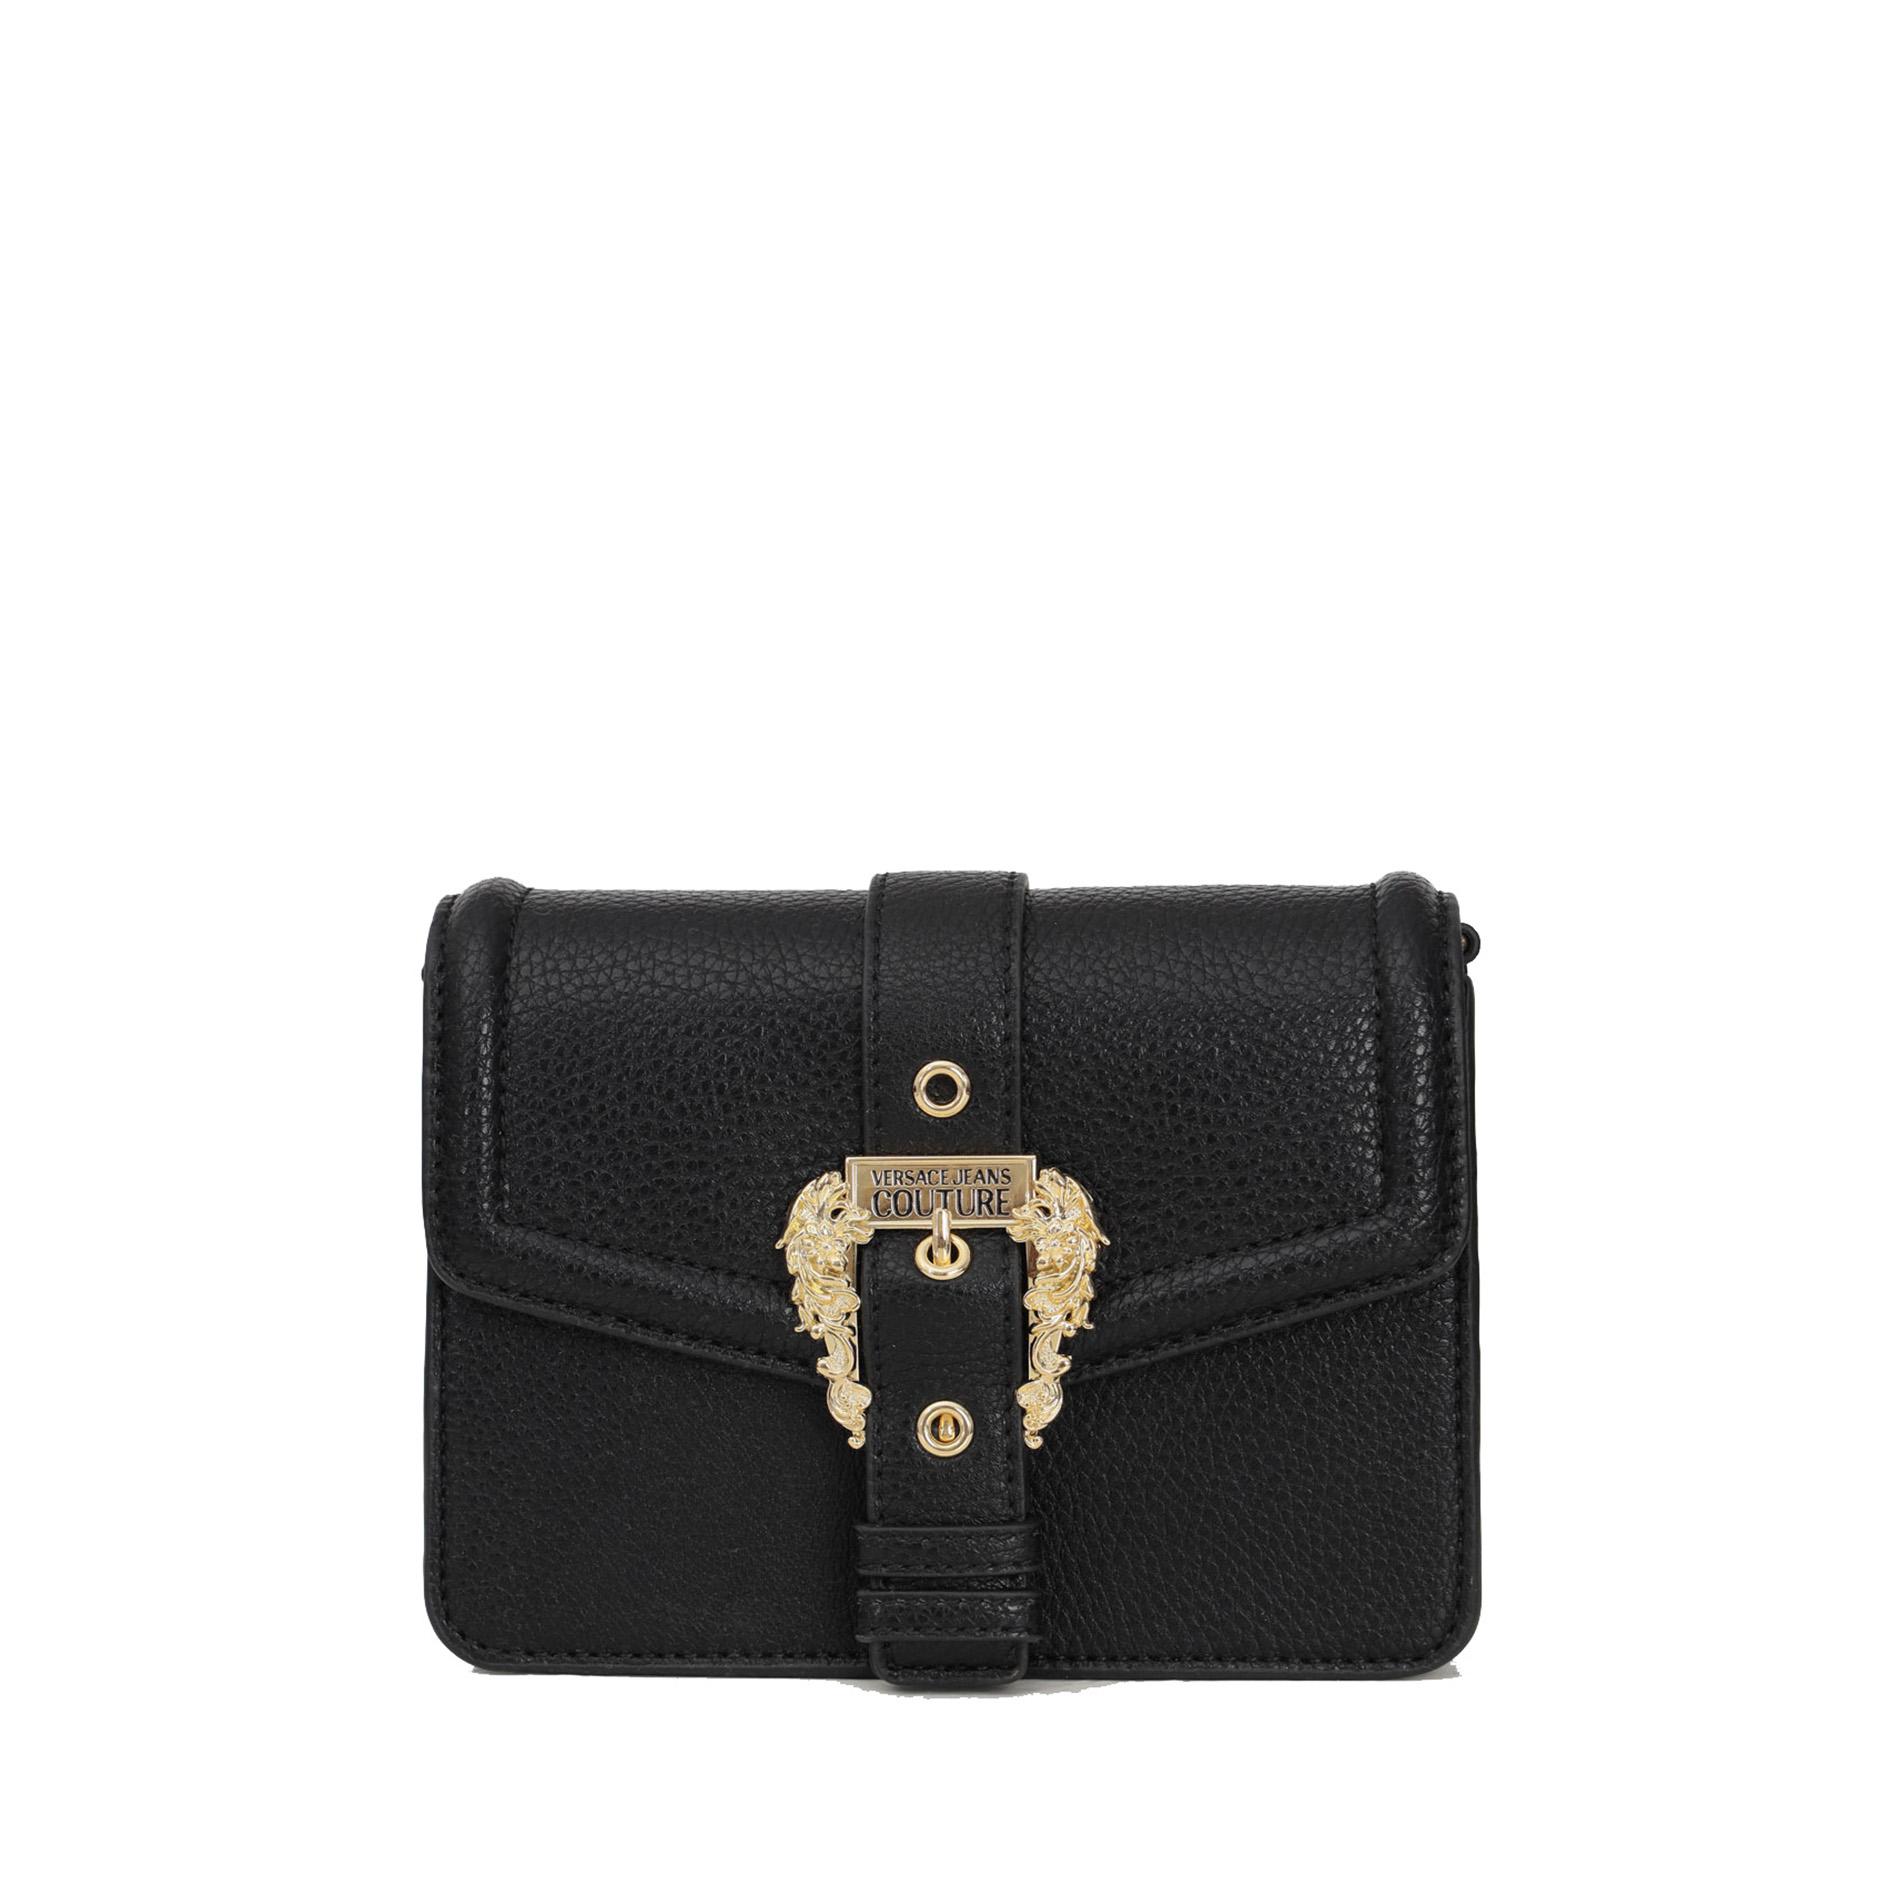 Borsa Versace Jeans 71VA4BF671578899 A.1